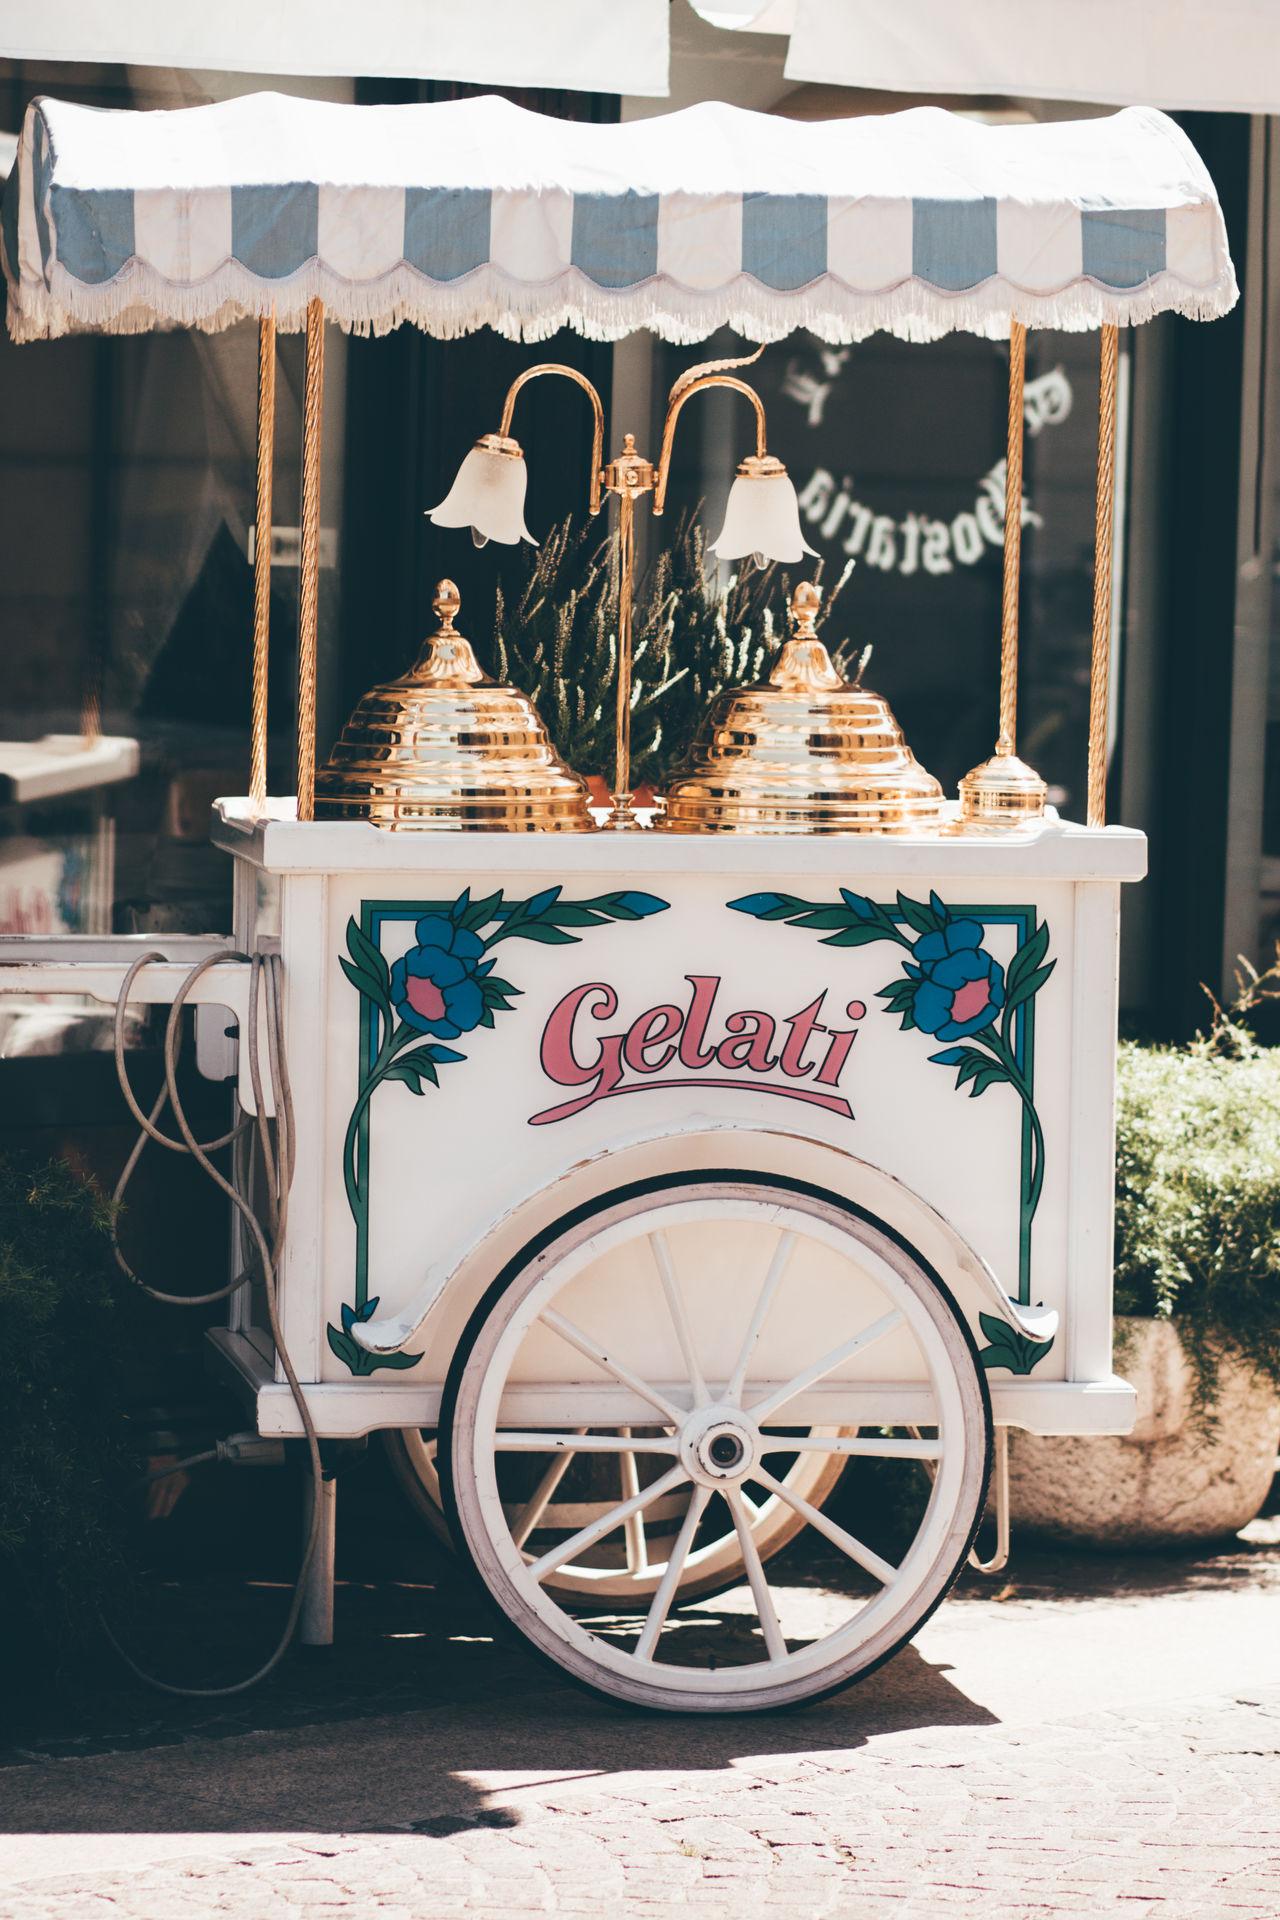 Day Eiskutsche Eismann Eiswagen Gelati Gelatin Dessert Ice Cream Italian Food Italian Ice Cream Italy No People Outdoors Travel